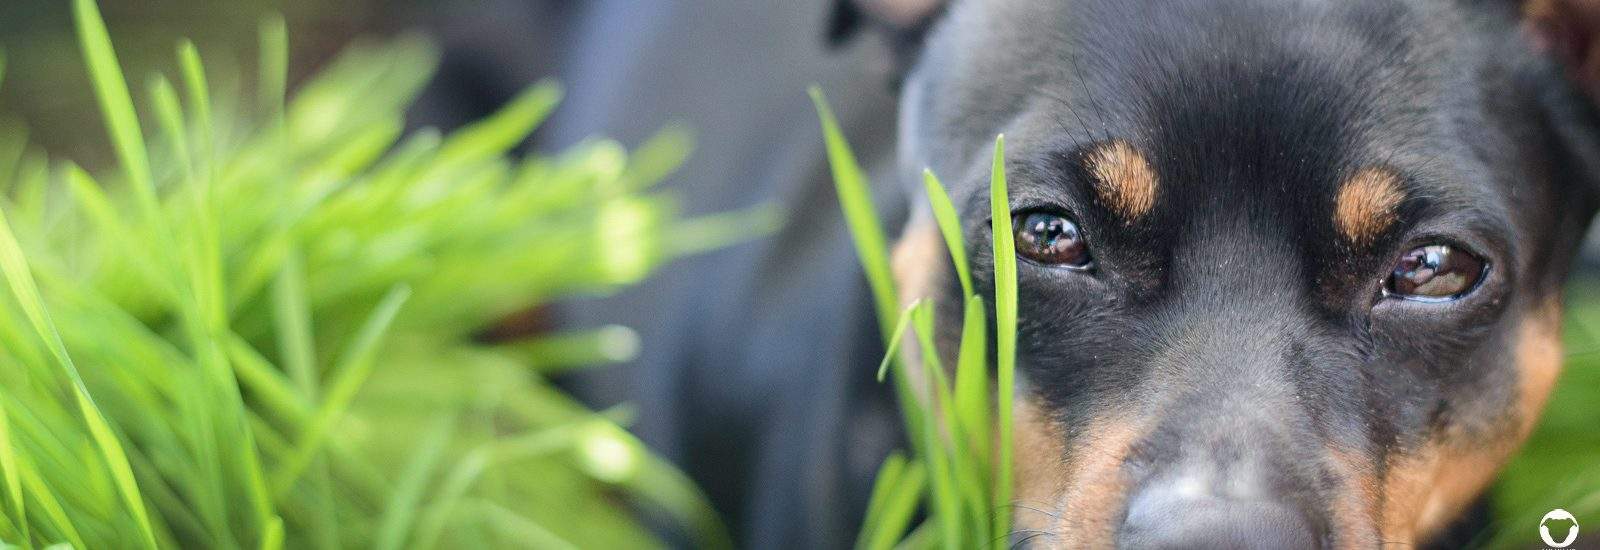 Pinscher Buddy, Hundeblog, Dogblog, Balkon, Wohnung, DIY, Wiese, Graskiste, selbstgemacht, Weizengras